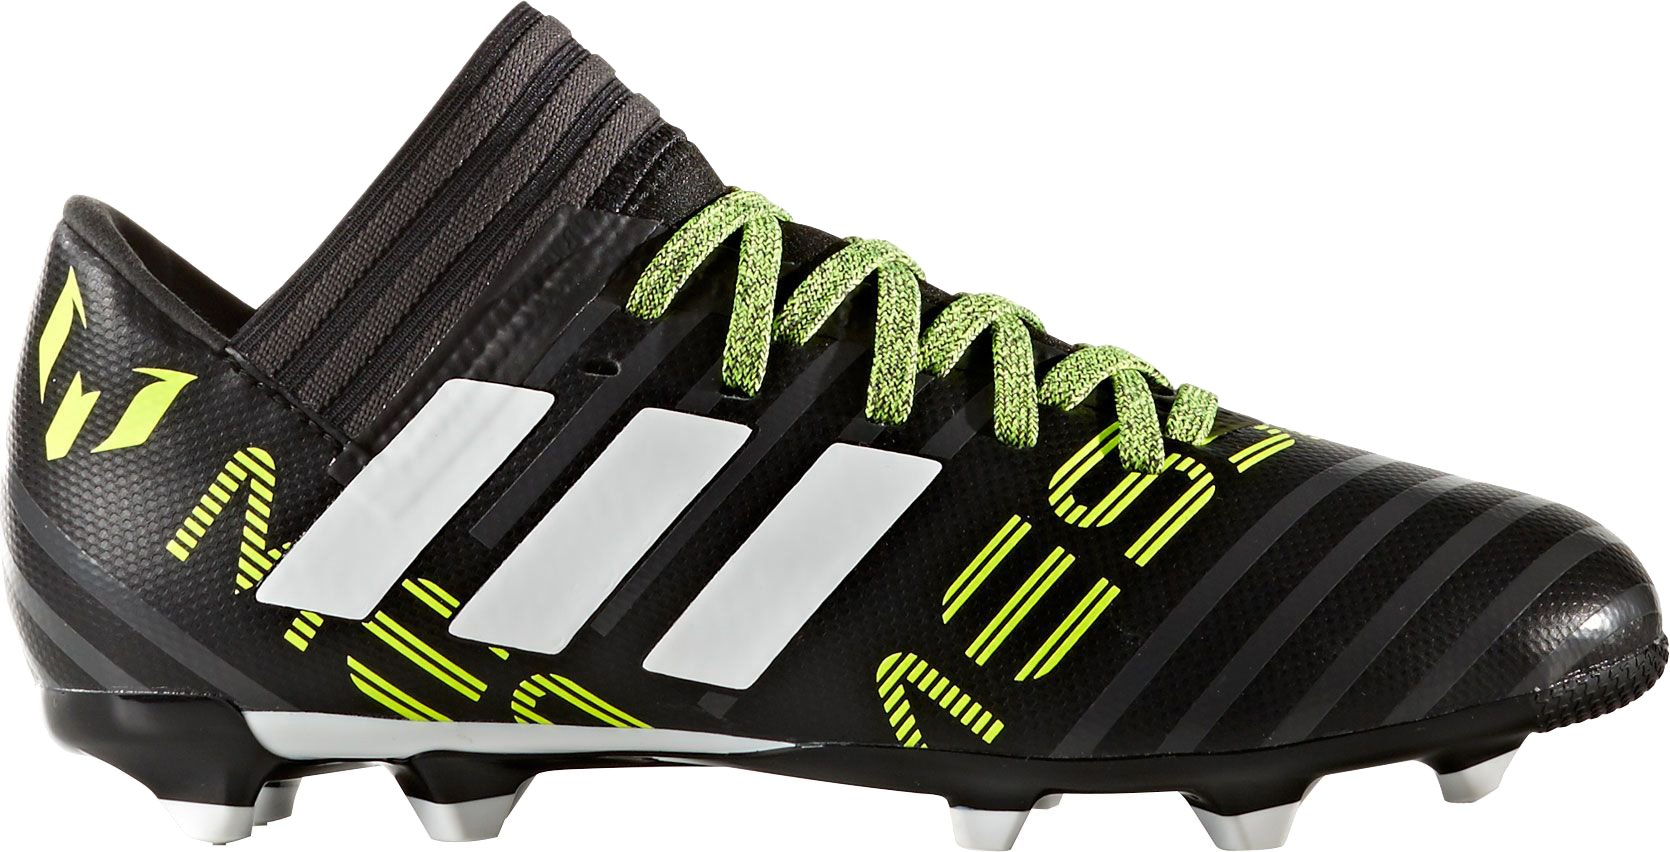 adidas Kids' Nemeziz Messi 17.3 Fg J Soccer-Shoes, Black/White/Solar Yellow, 3.5 Big Kid by adidas